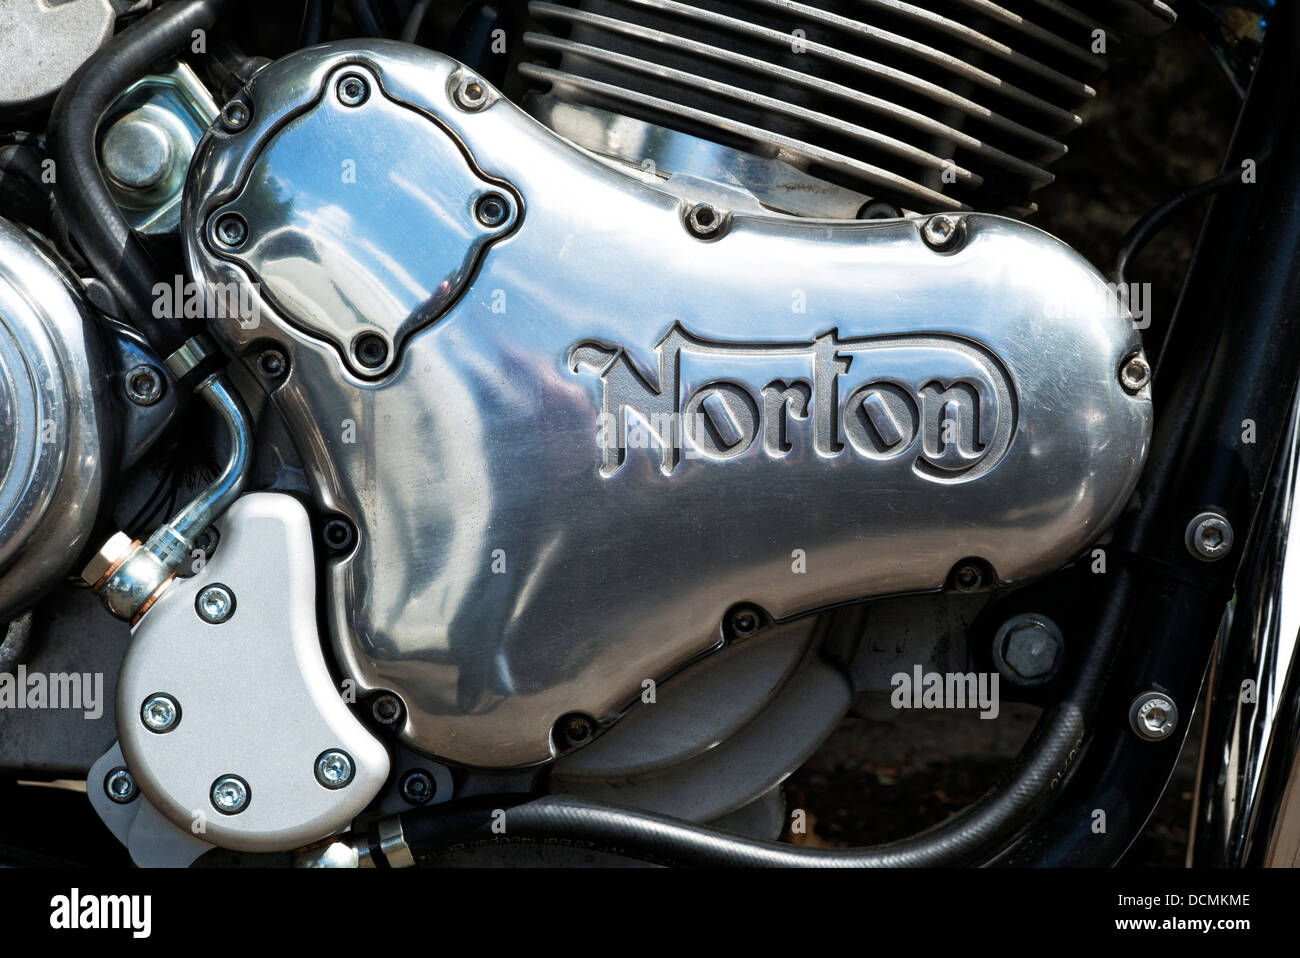 Norton-Motorrad-Motor-Gehäuse. Klassische britische Motorrad Stockbild